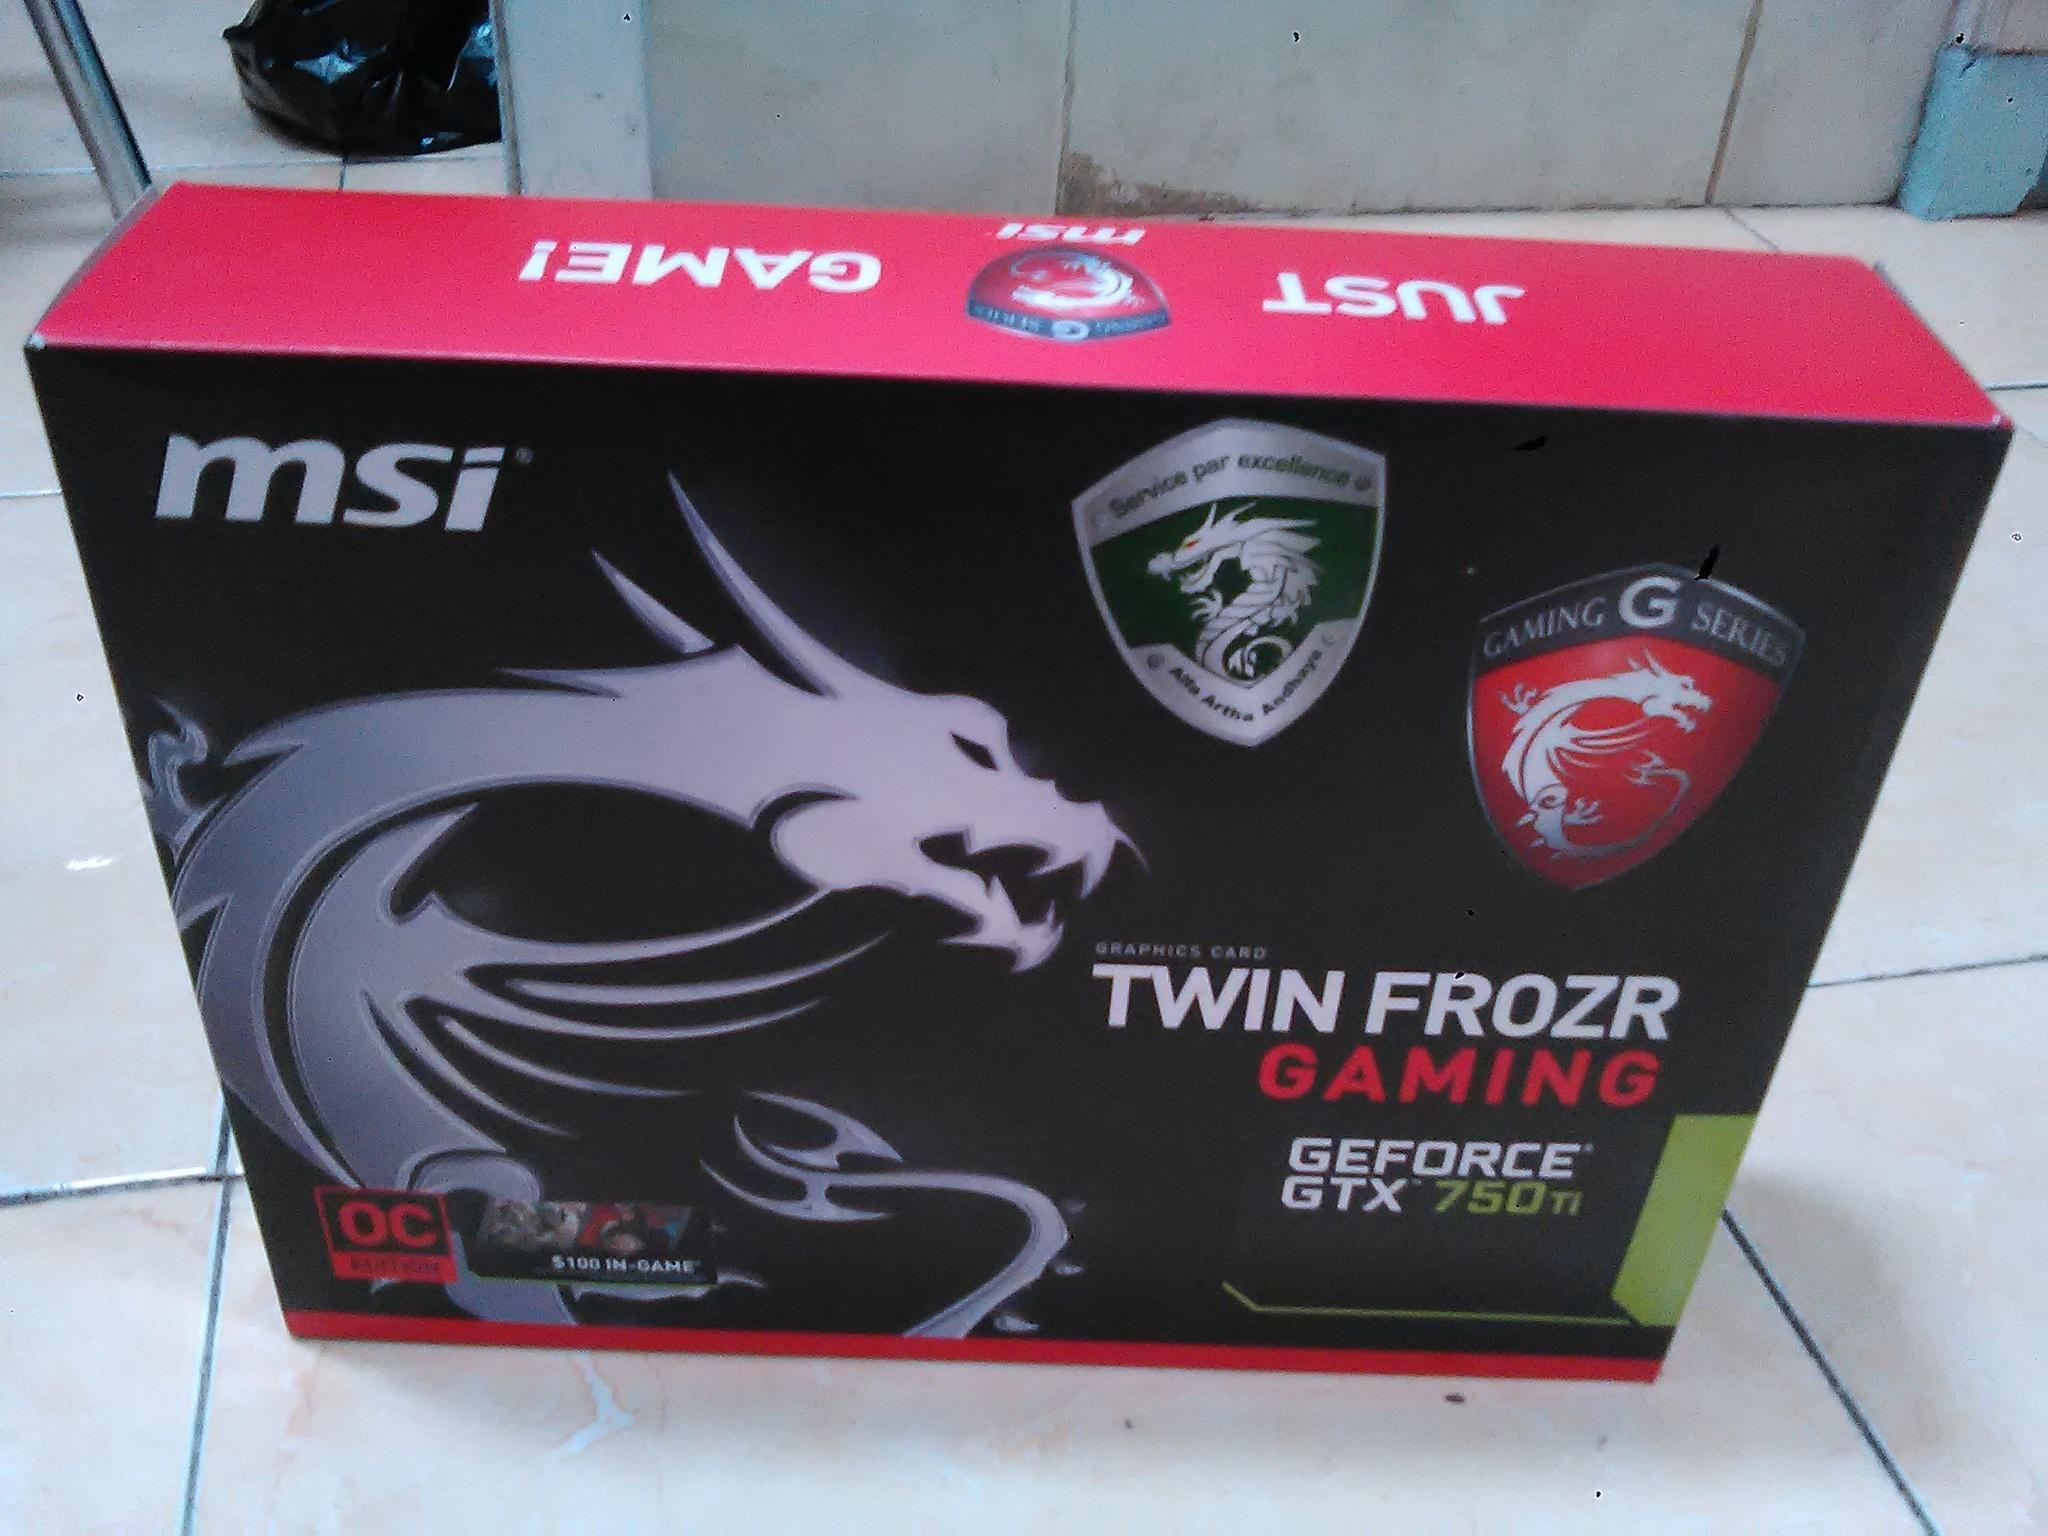 Jual Msi Geforce Gtx 750 Ti 2gb Ddr5 Twin Frozr Bonnibel Store Gaming Tokopedia